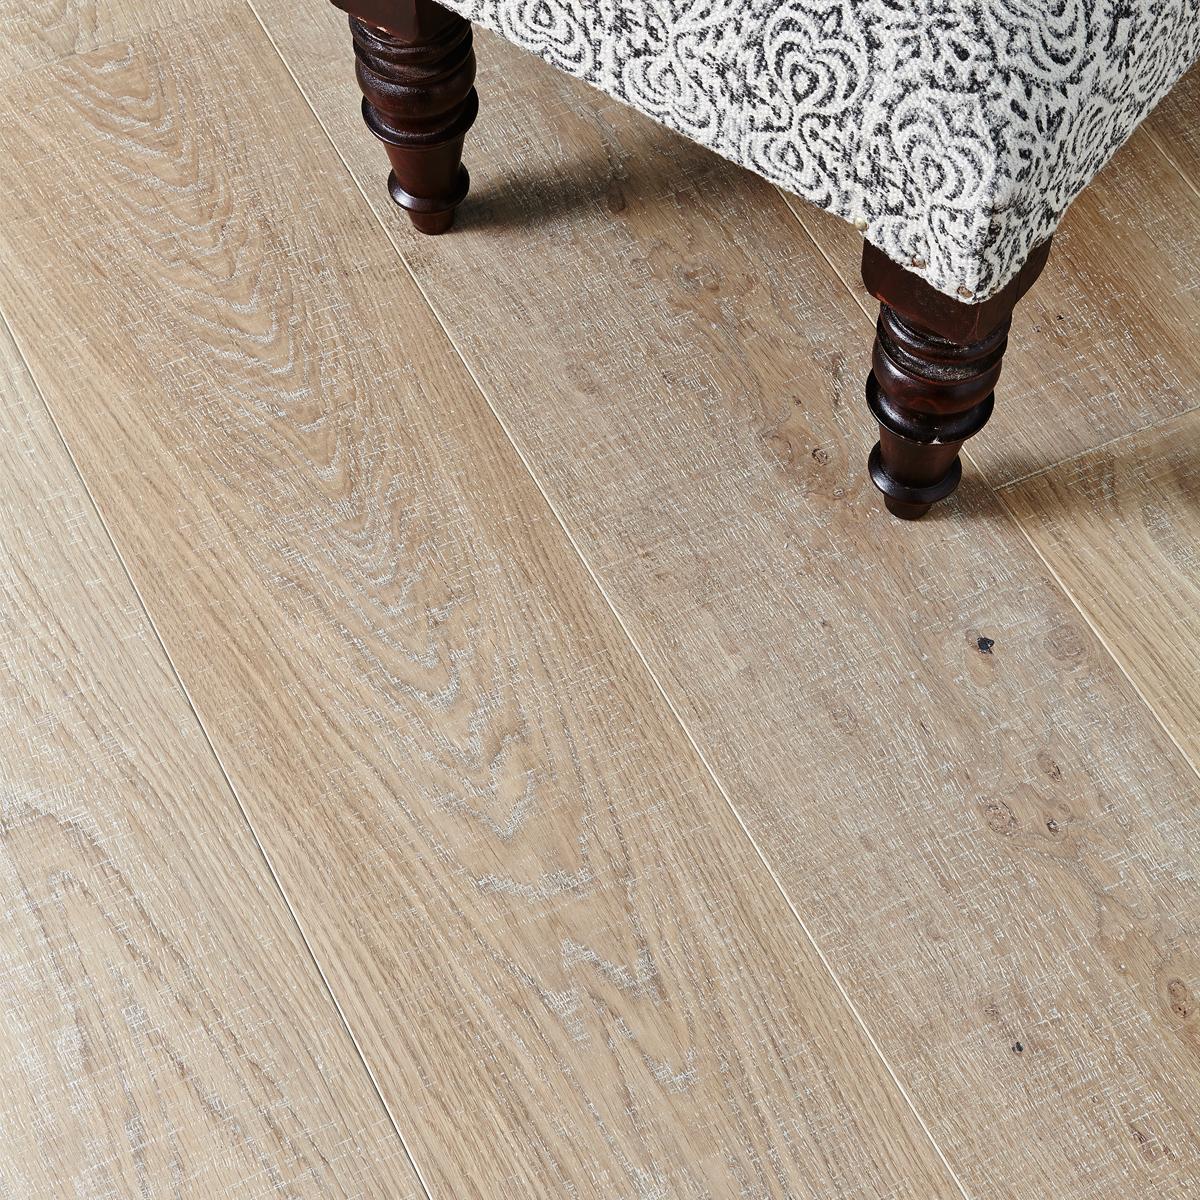 Ted todd coombe oasa001 engineered wood bestatflooring for Classic wood floors